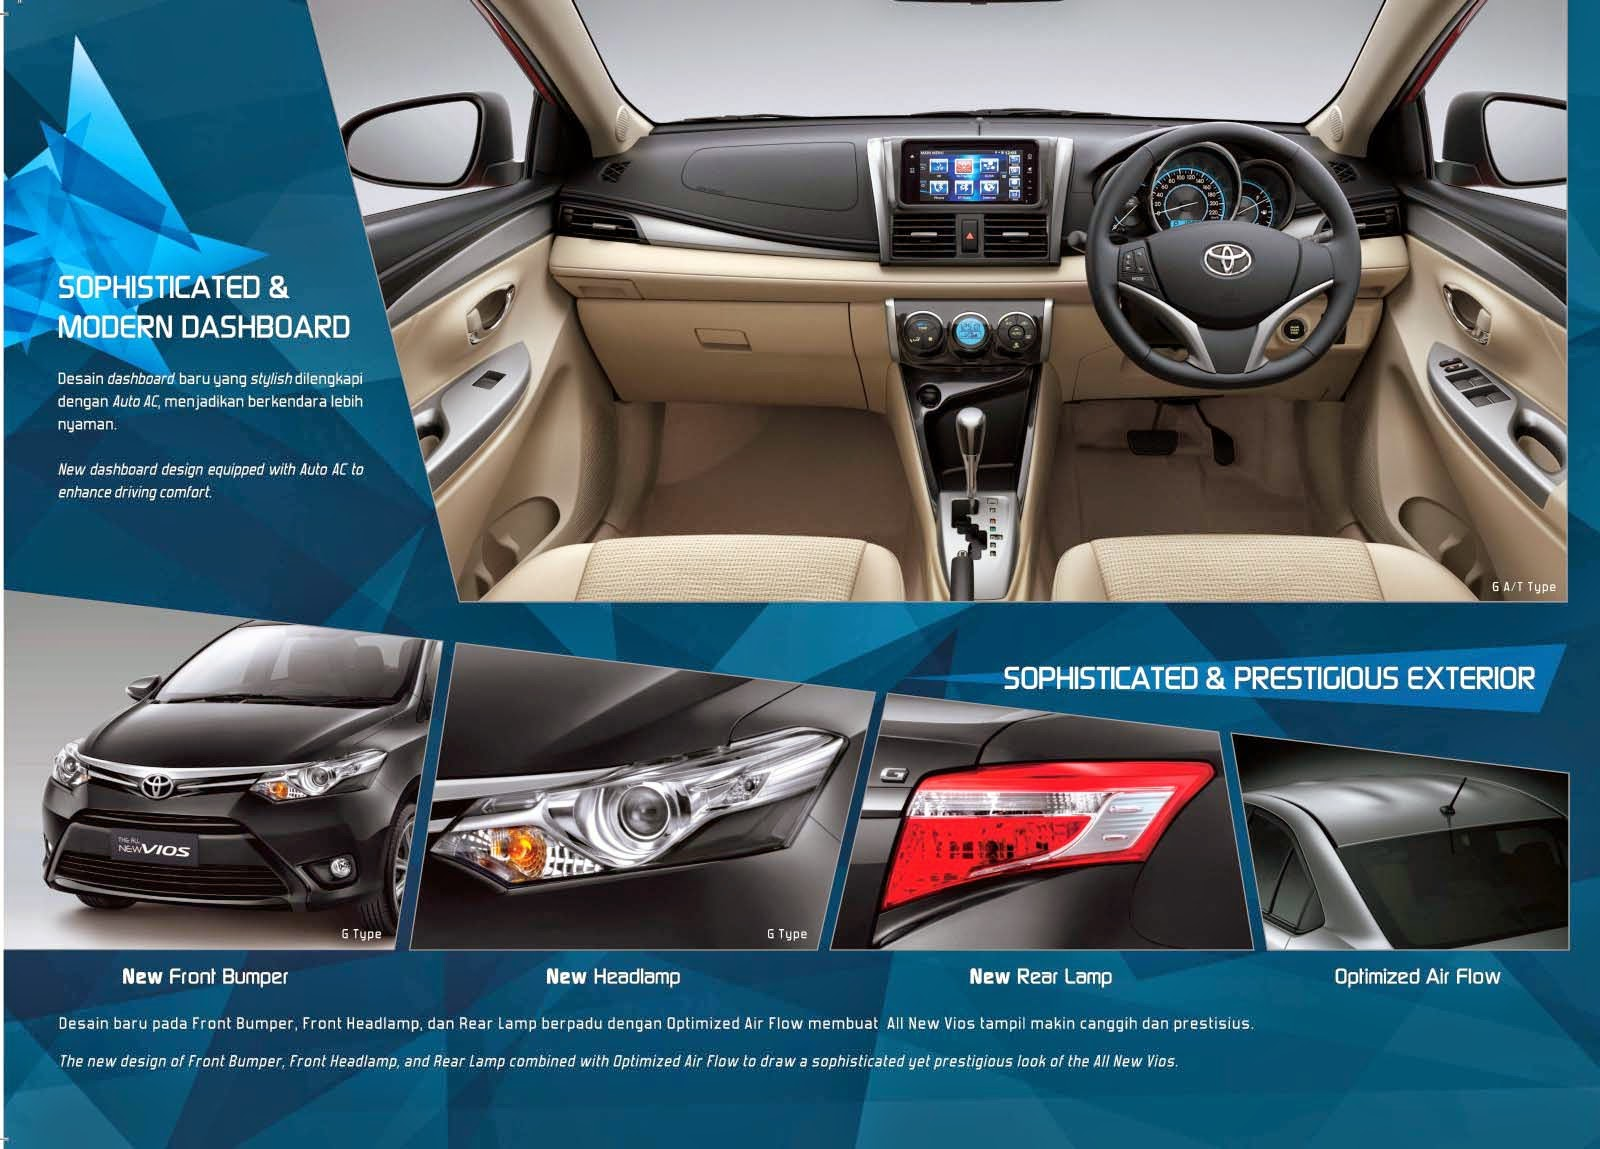 Spesifikasi New Innova Venturer 2018 Price All Toyota Vios Terbaru 2015 Liputan